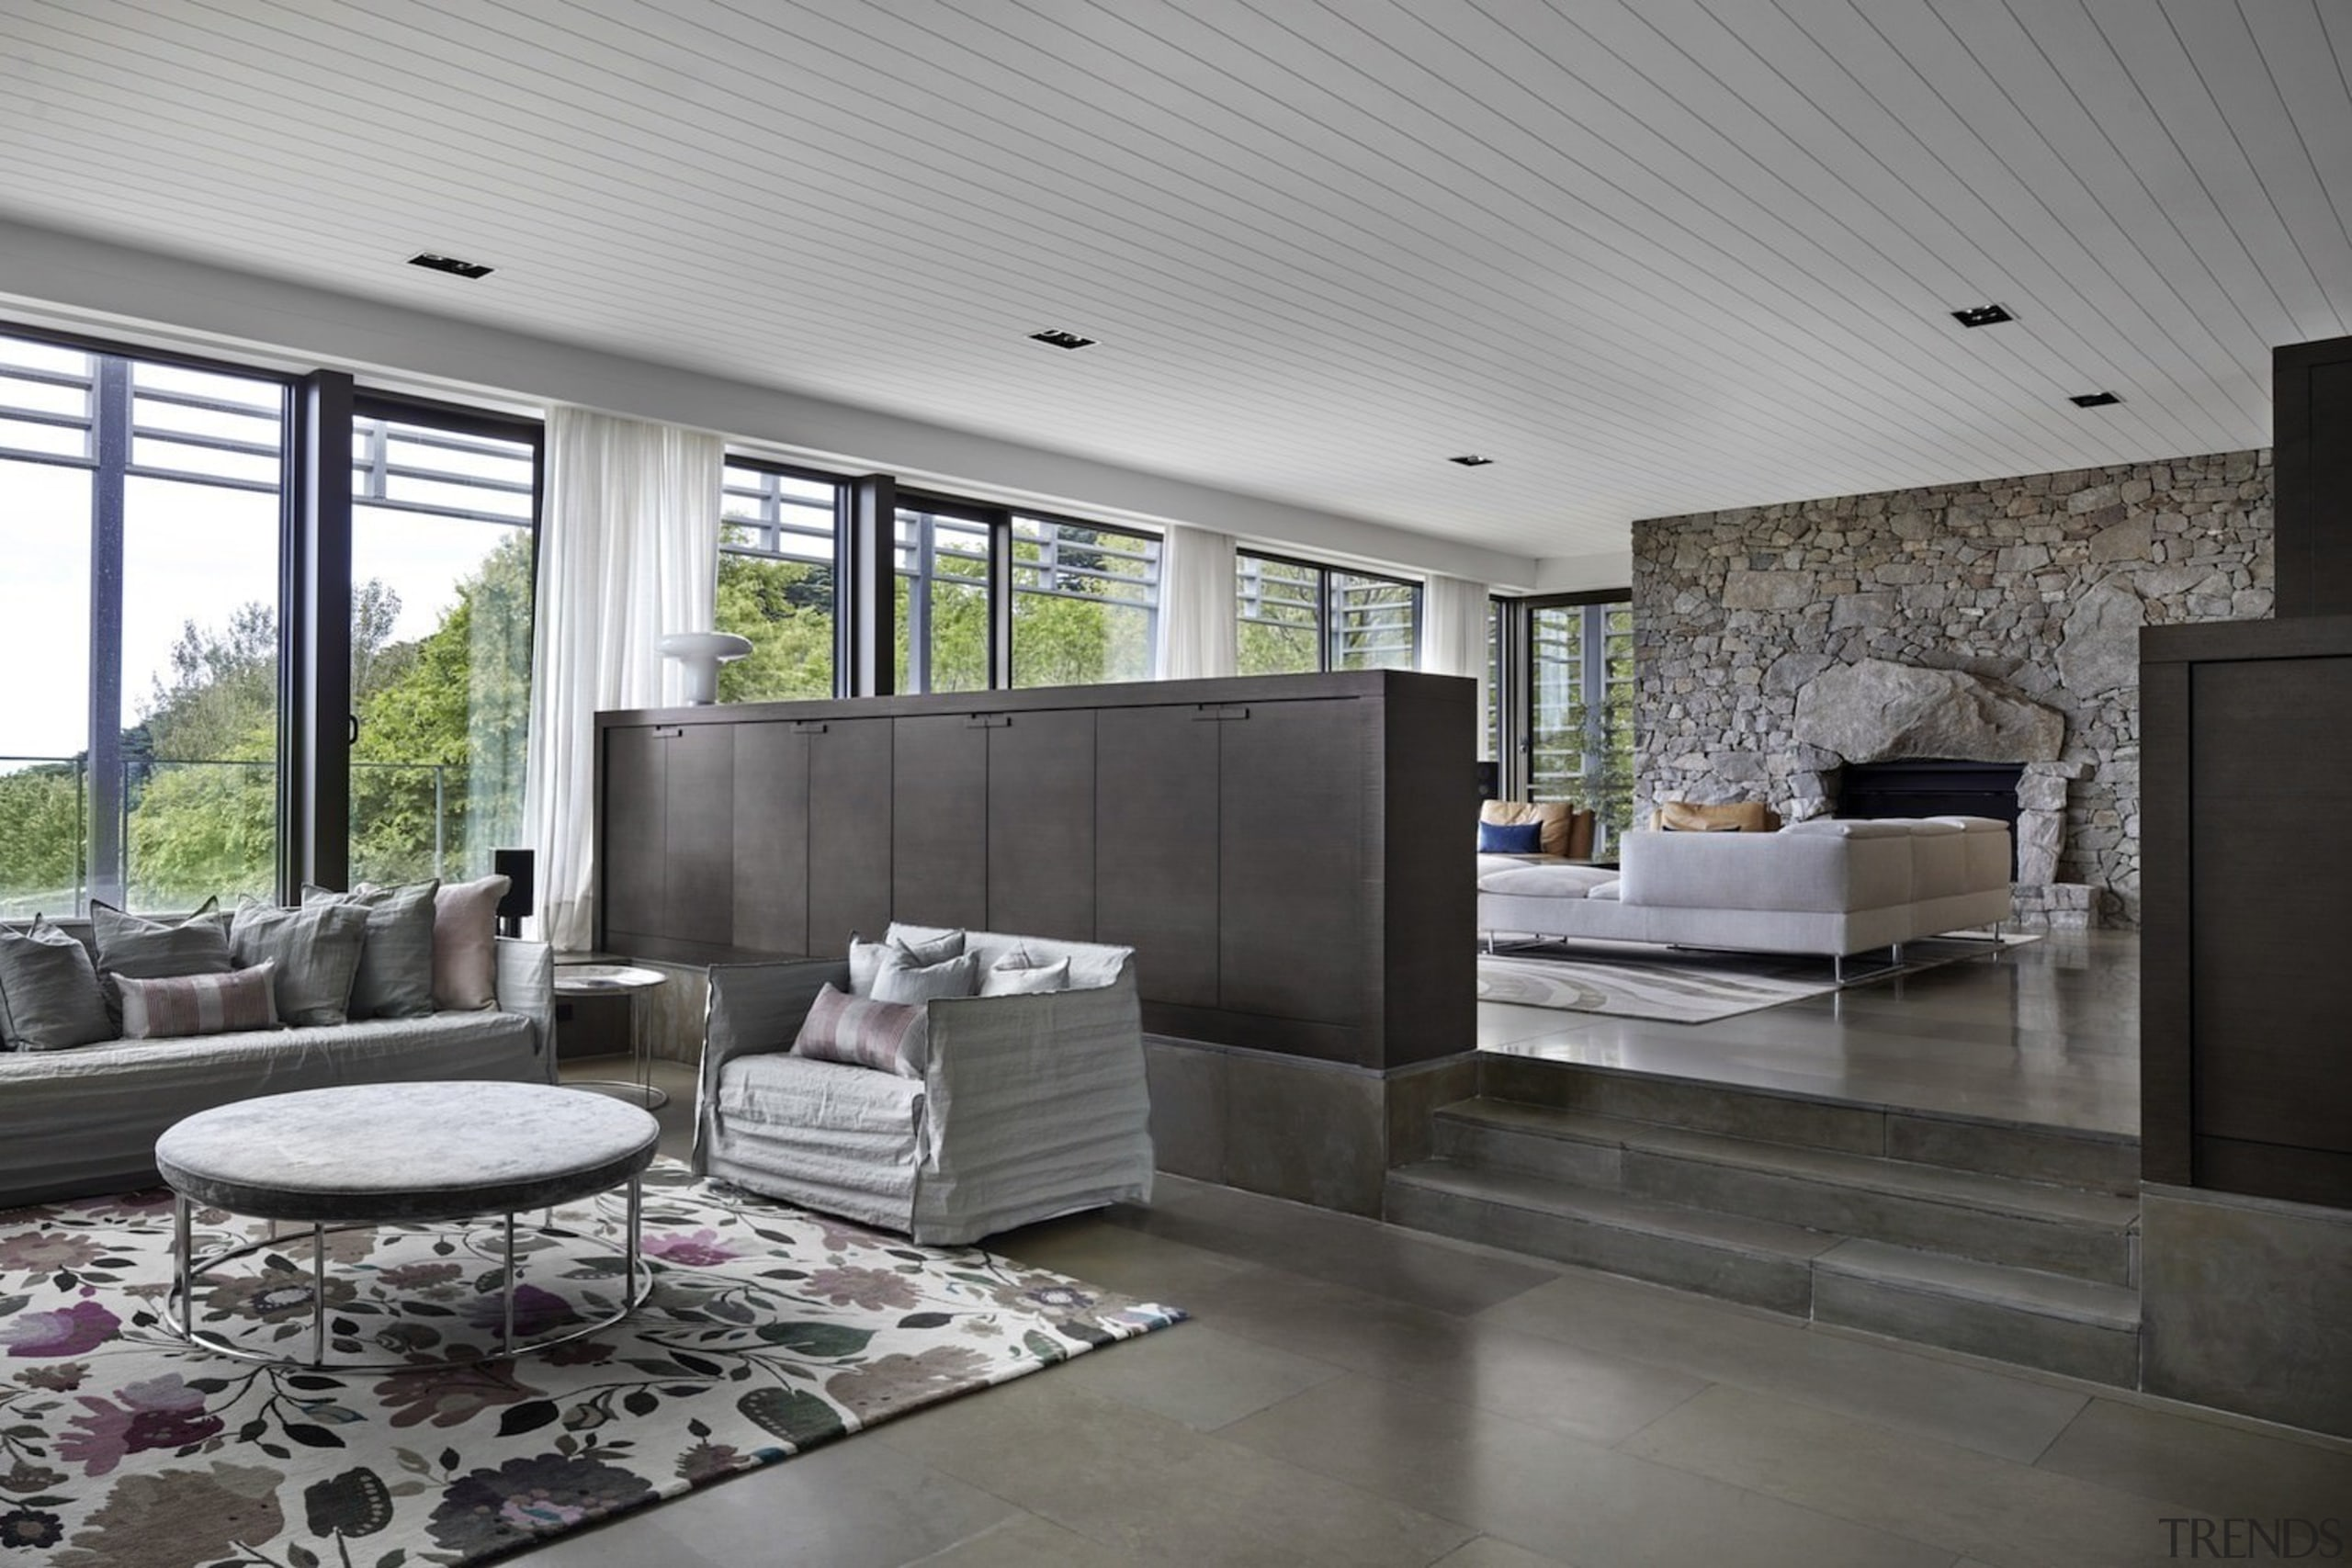 Architect: B.E Architecture architecture, ceiling, floor, house, interior design, living room, lobby, real estate, gray, black